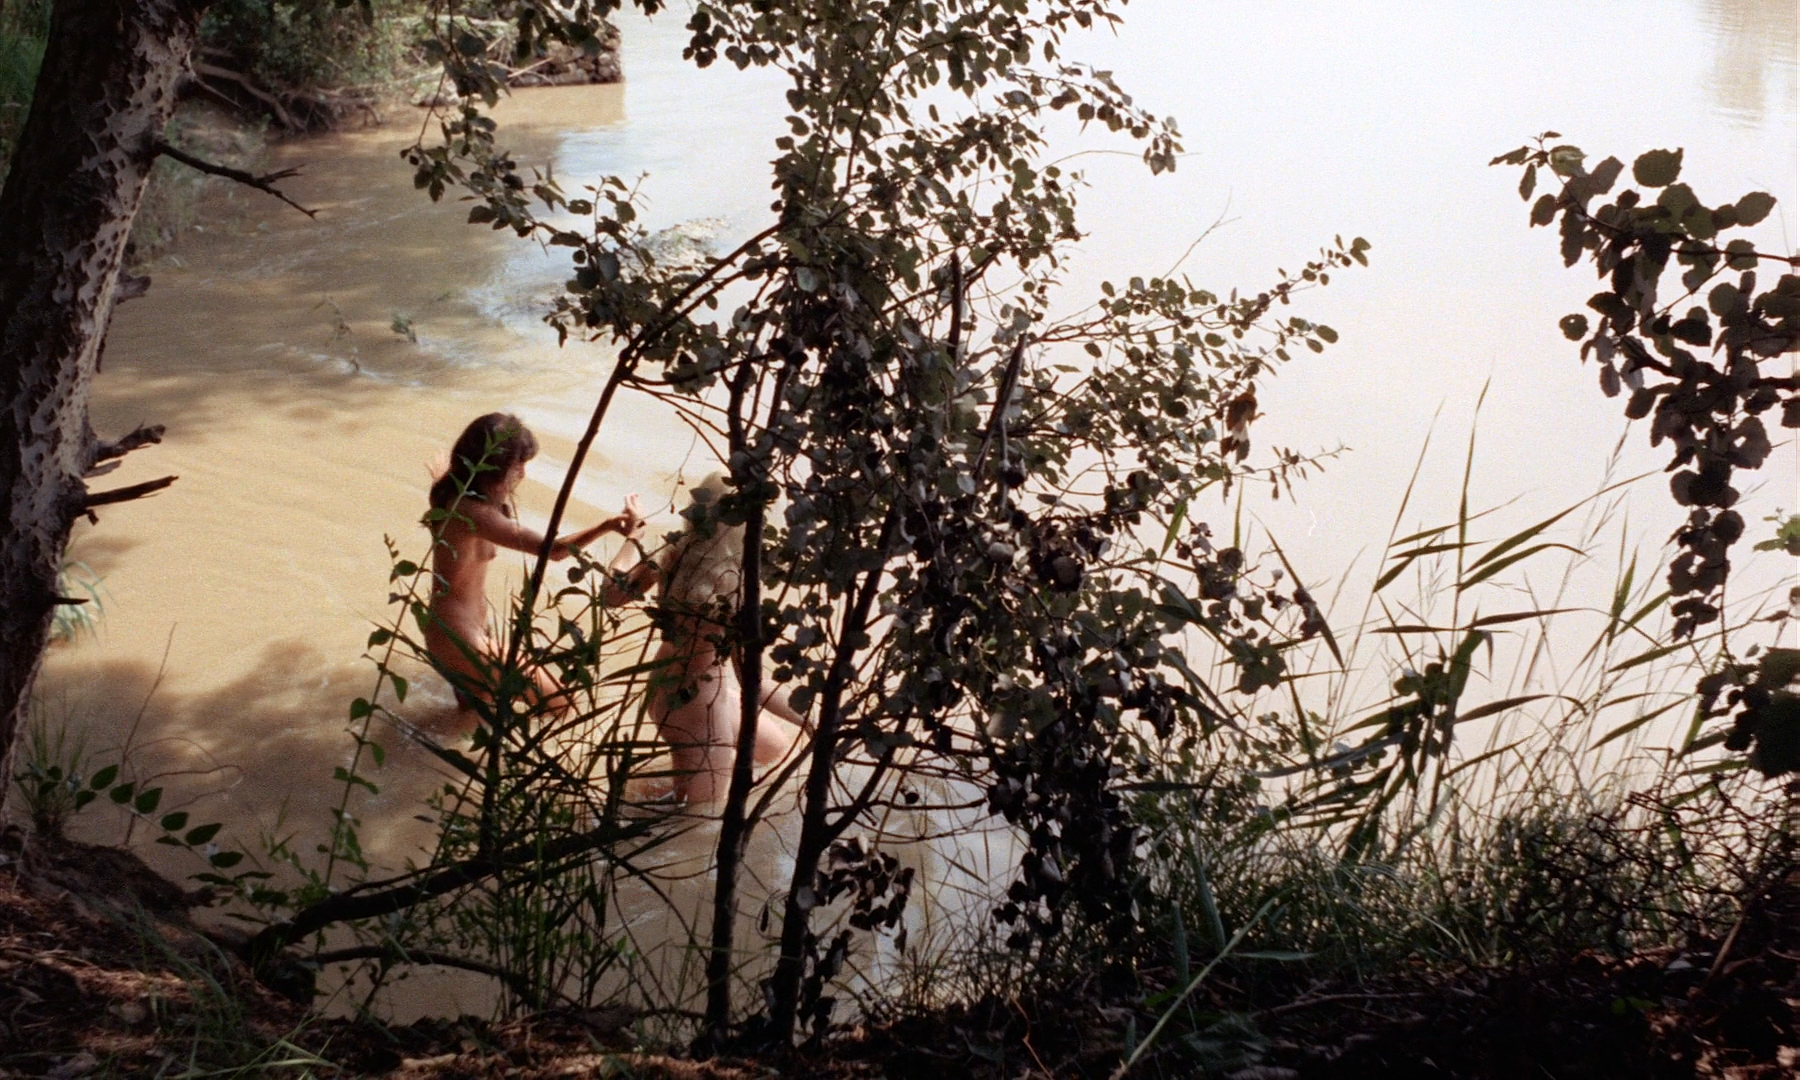 Romina Power nude toplees, Sylva Koscina nude Rosemary Dexter and Maria Rohm nude bush - Marquis de Sade - Justine (IT-1969) HD 1080p BluRay (14)